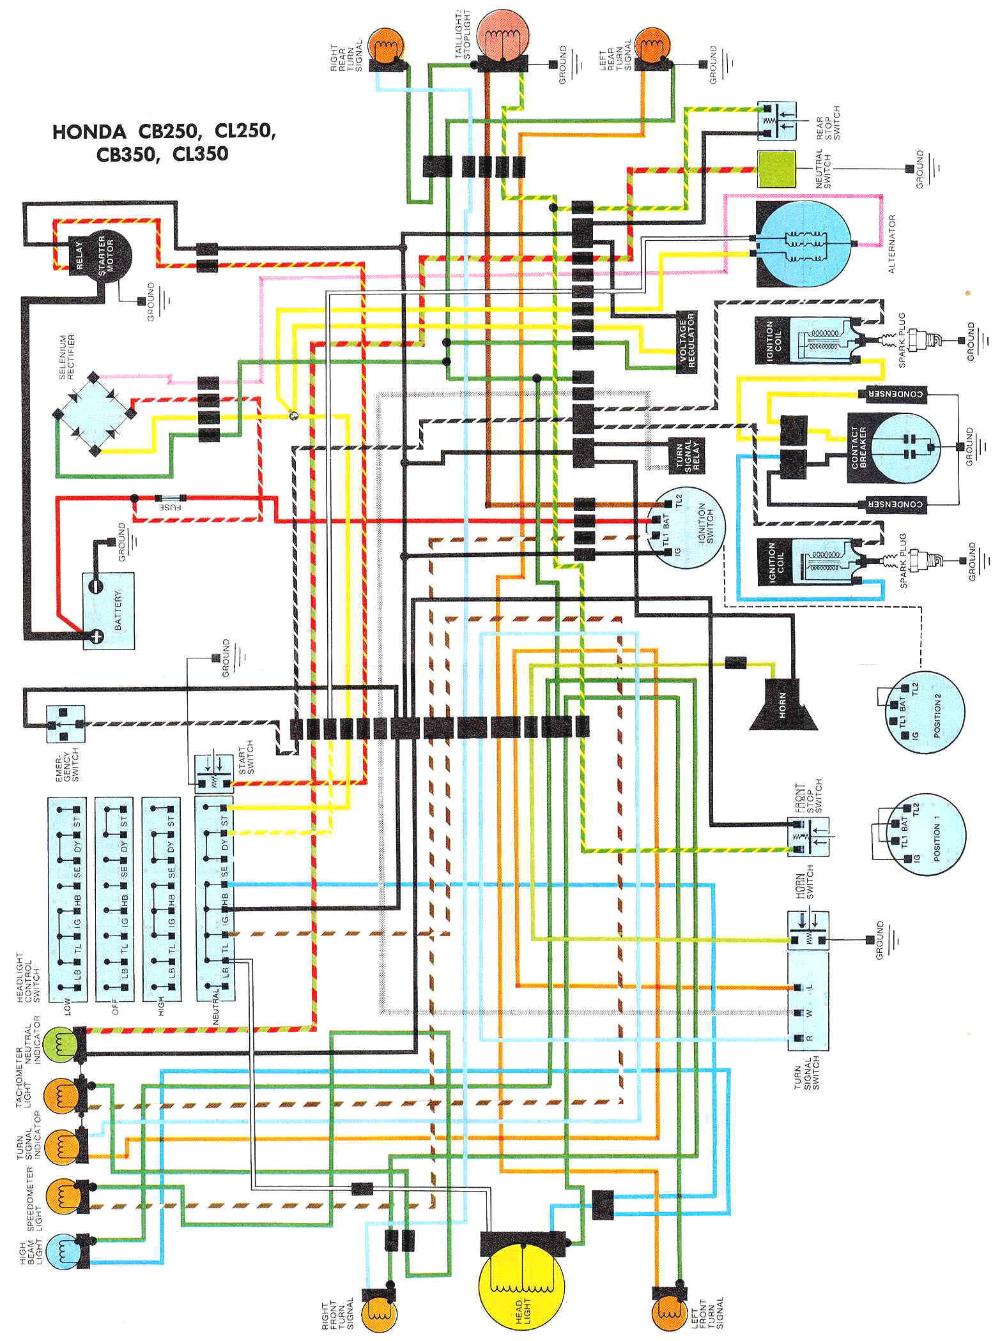 Honda Cb250 Wiring Diagram Online Wiring Diagram Cb350 Cl350 Diagram